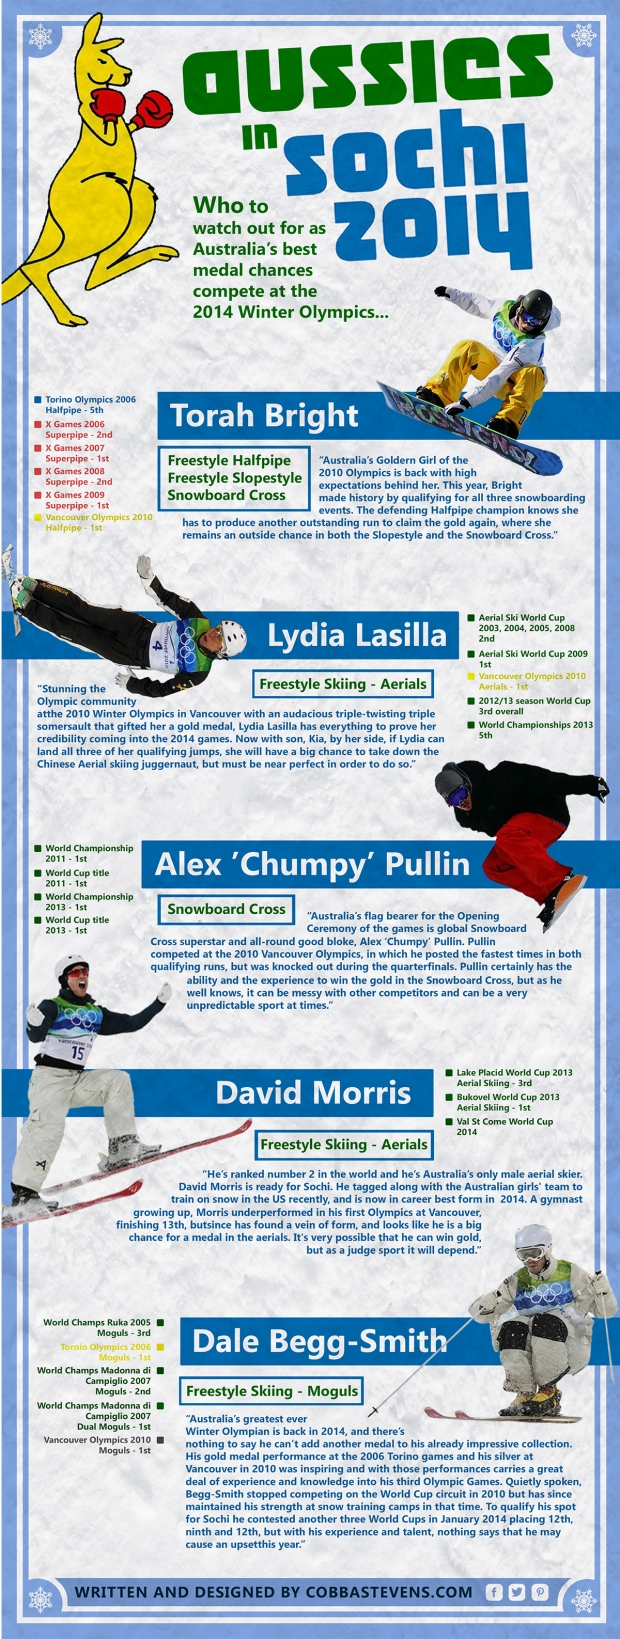 Aussies in Sochi